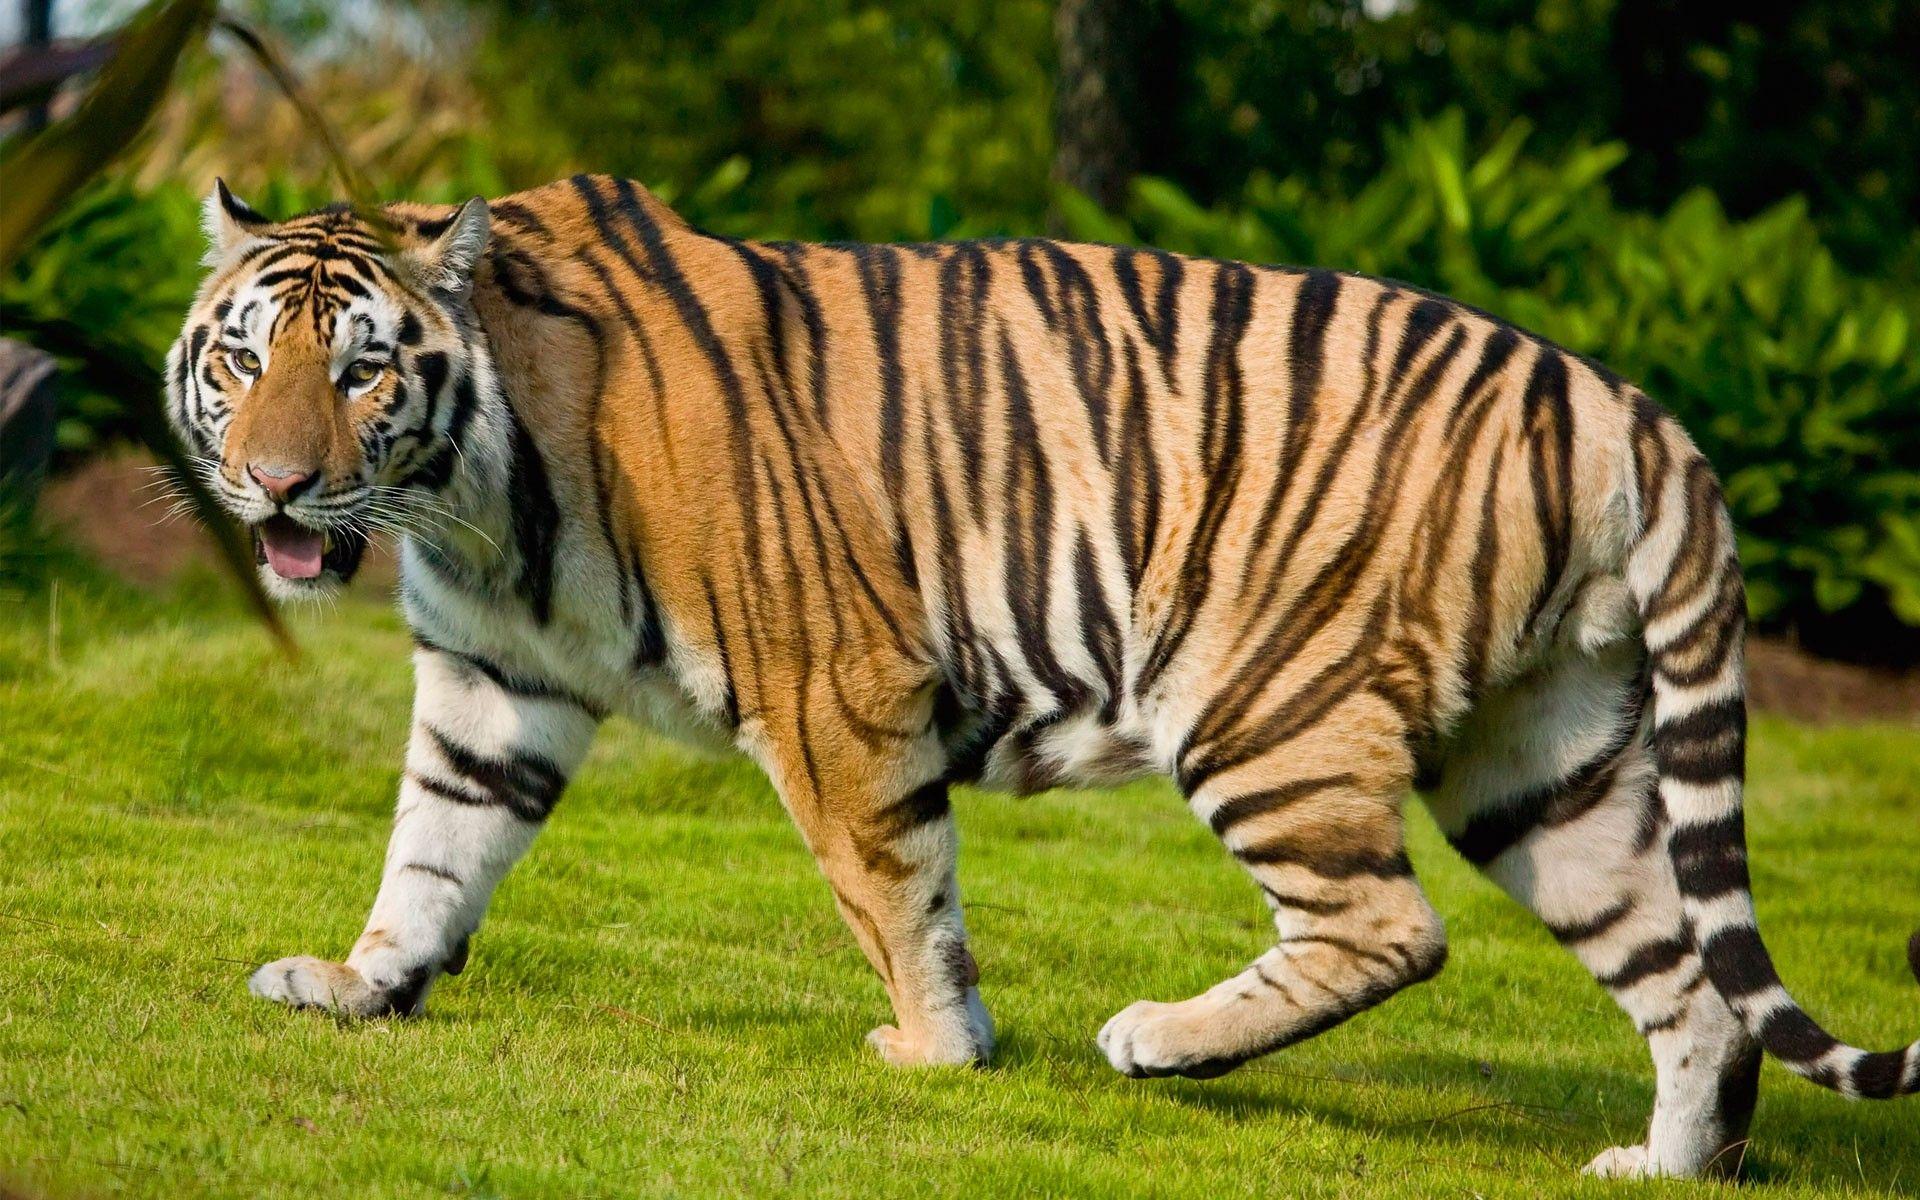 Tiger Tiger Wallpaper Pet Tiger Tiger